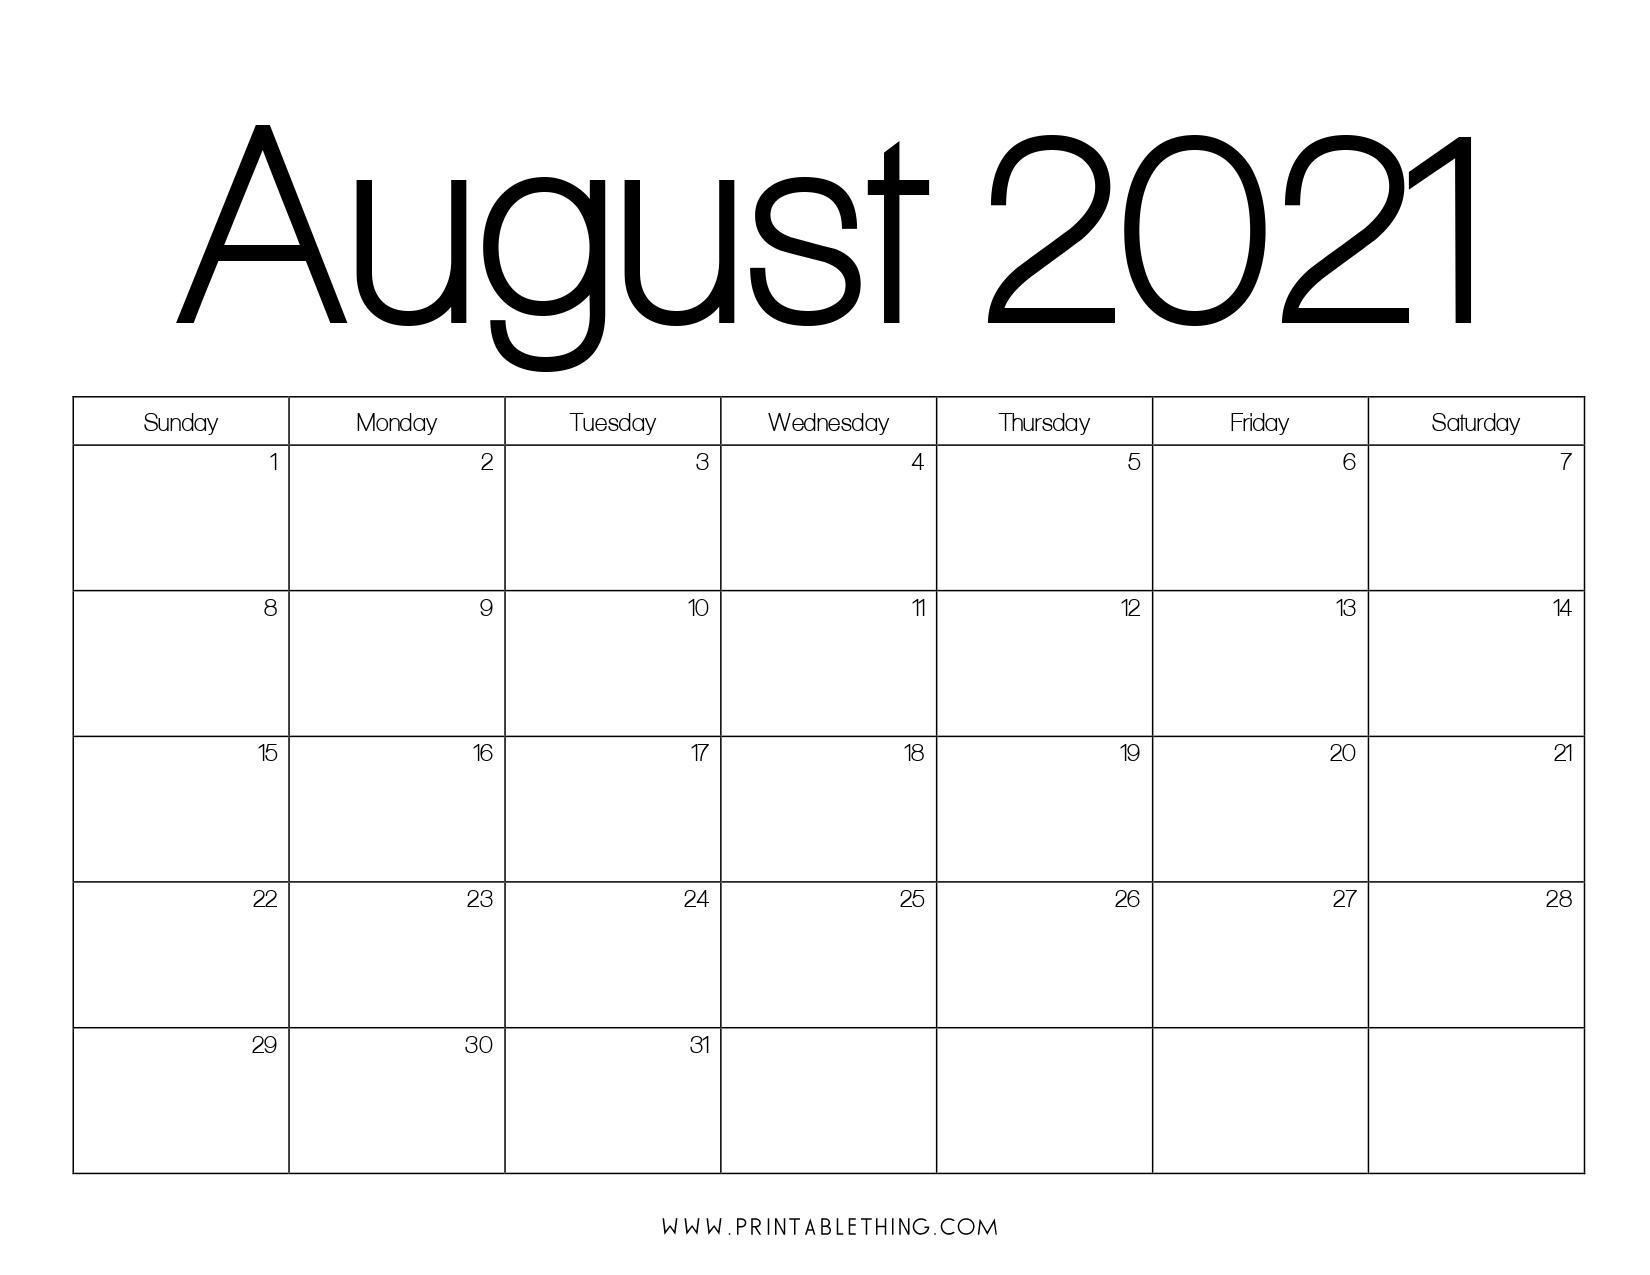 August 2021 Calendar PDF, August 2021 Calendar Image ...